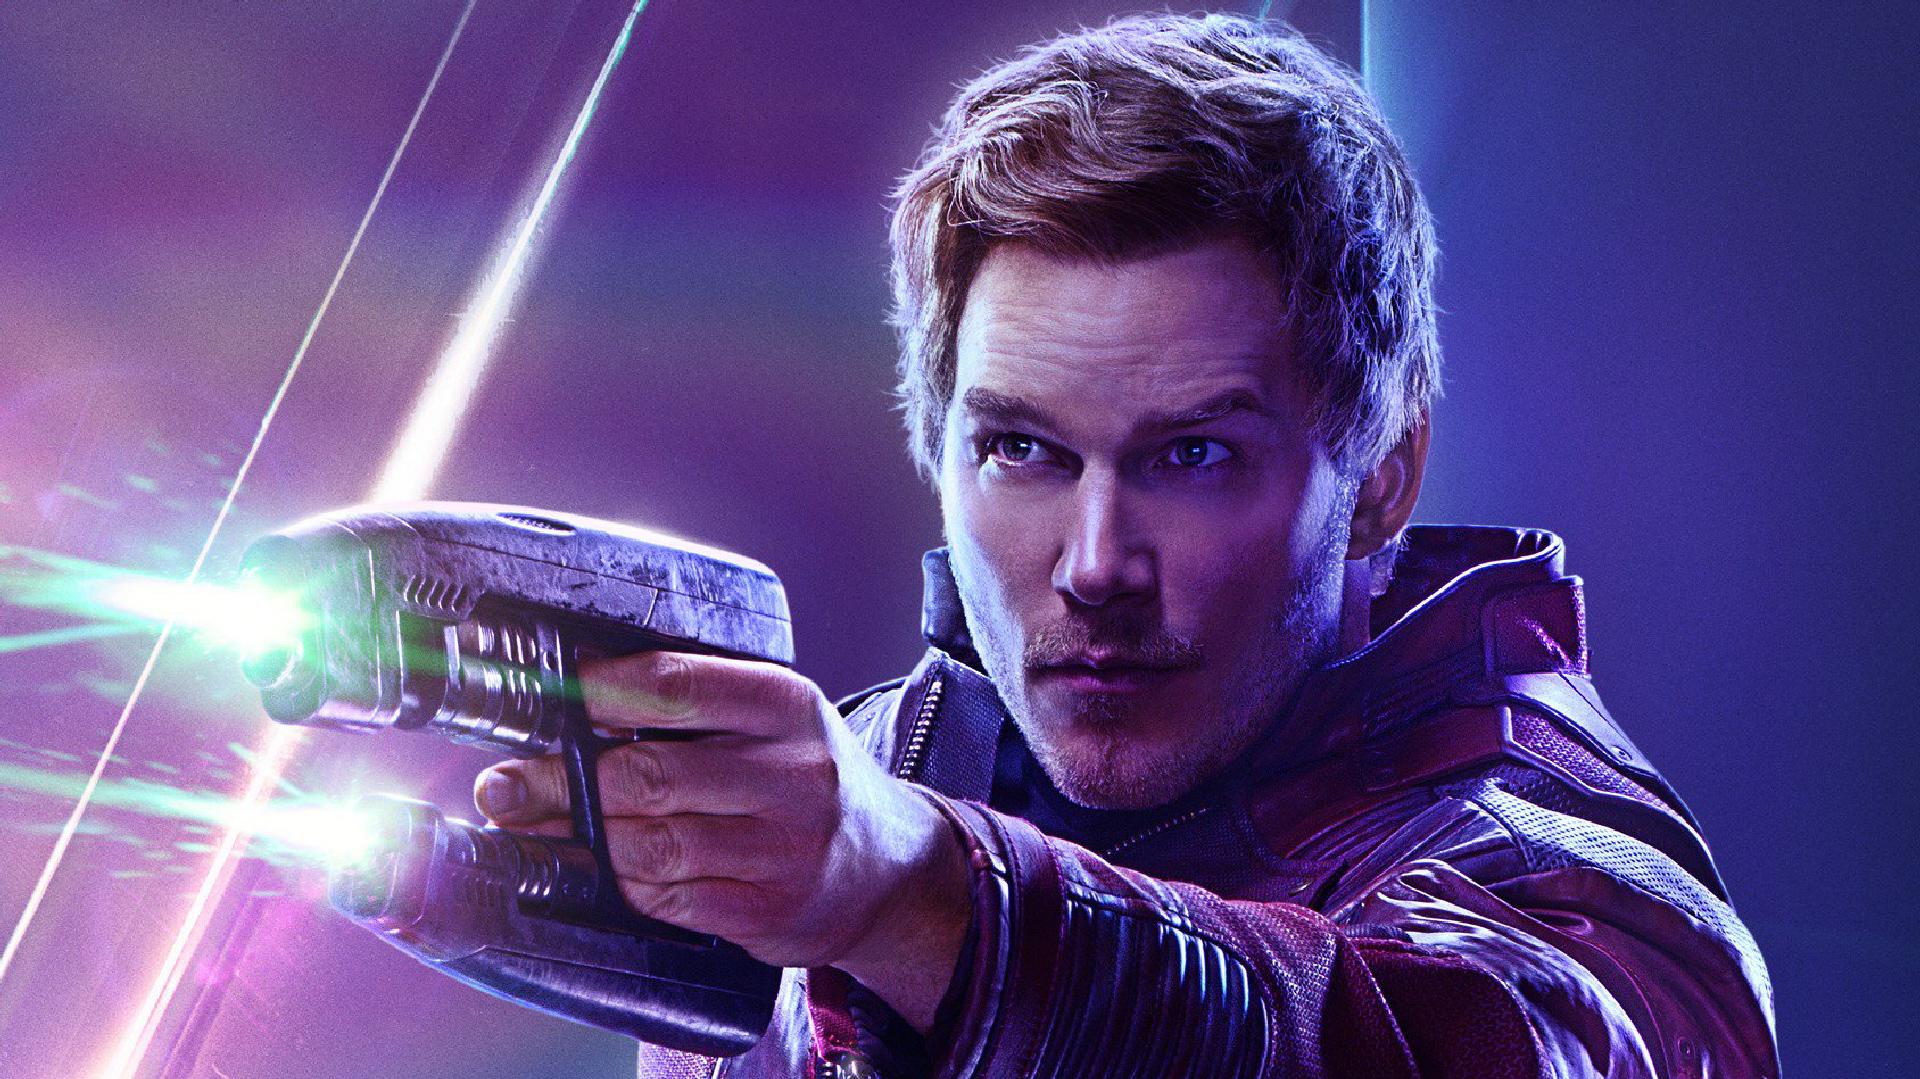 Shuri In Avengers Infinity War New Poster Hd Movies 4k: Star Lord In Avengers Infinity War New Poster, HD Movies